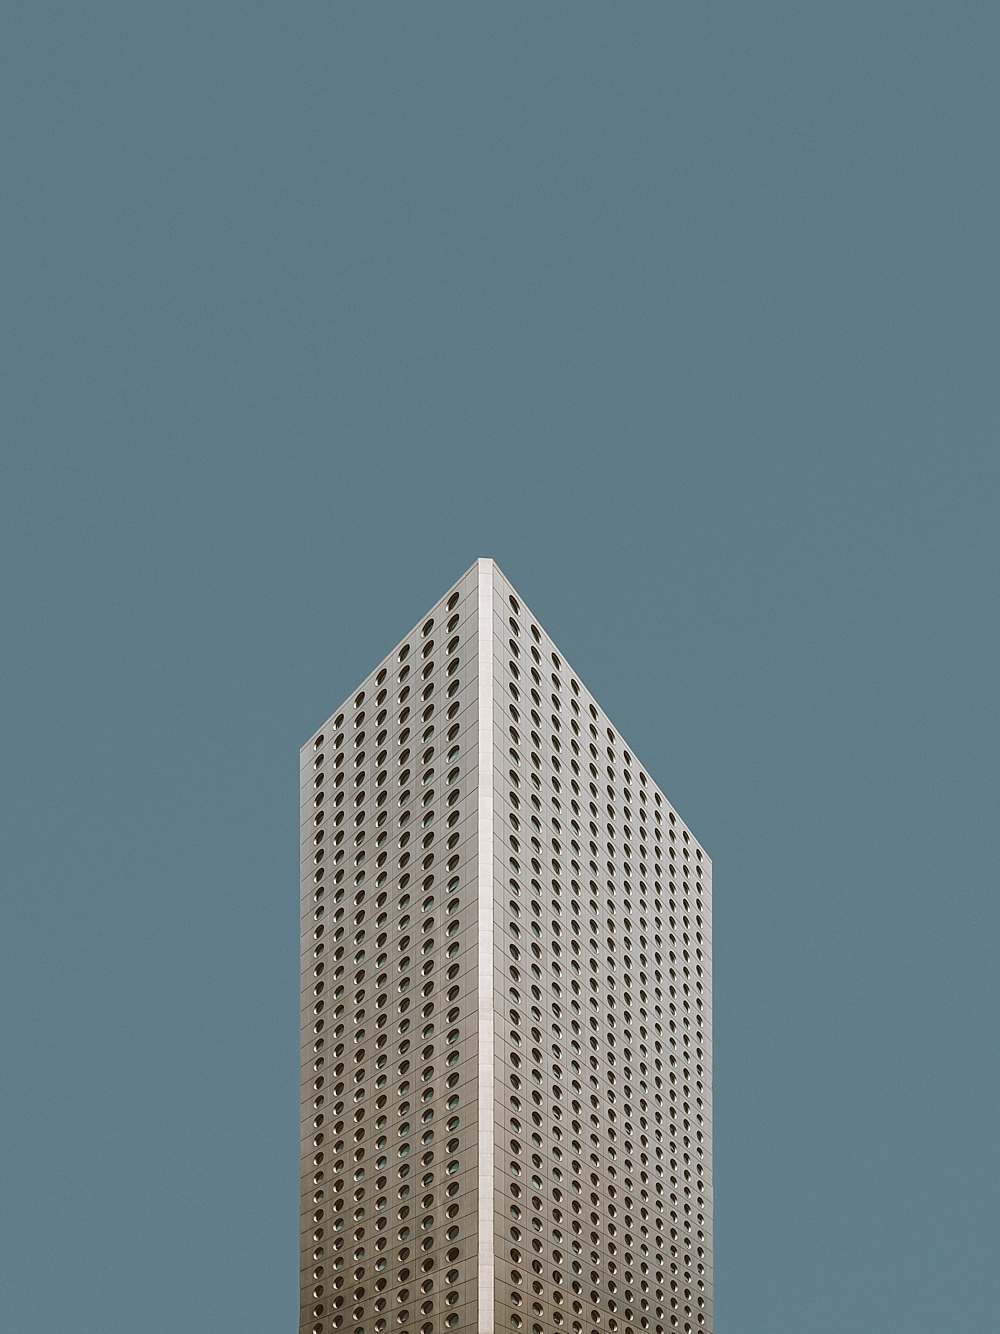 singularity_12-HongKong